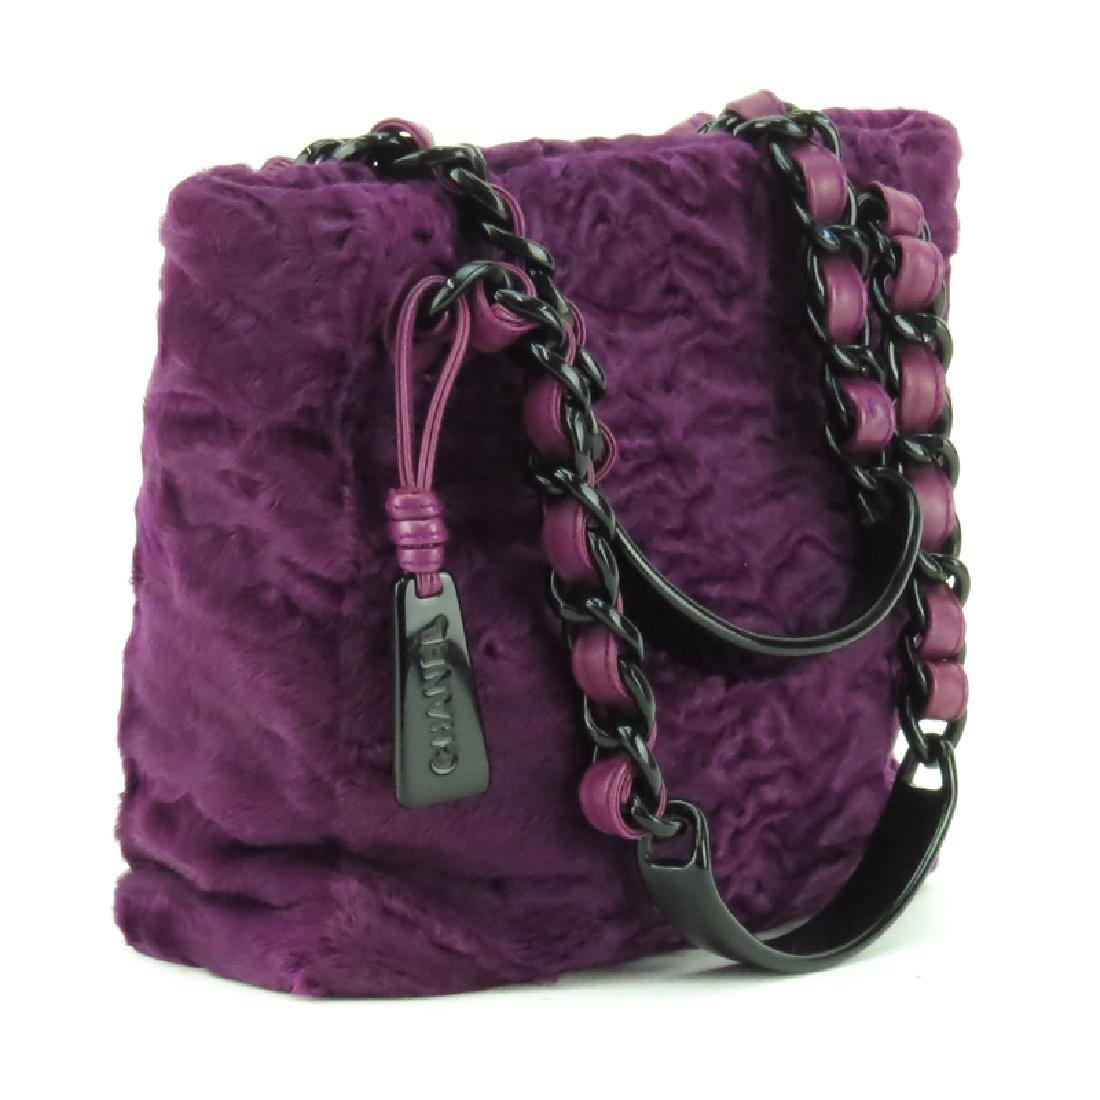 Chanel Purple Astrakhan Fur Small Tote. Black resin